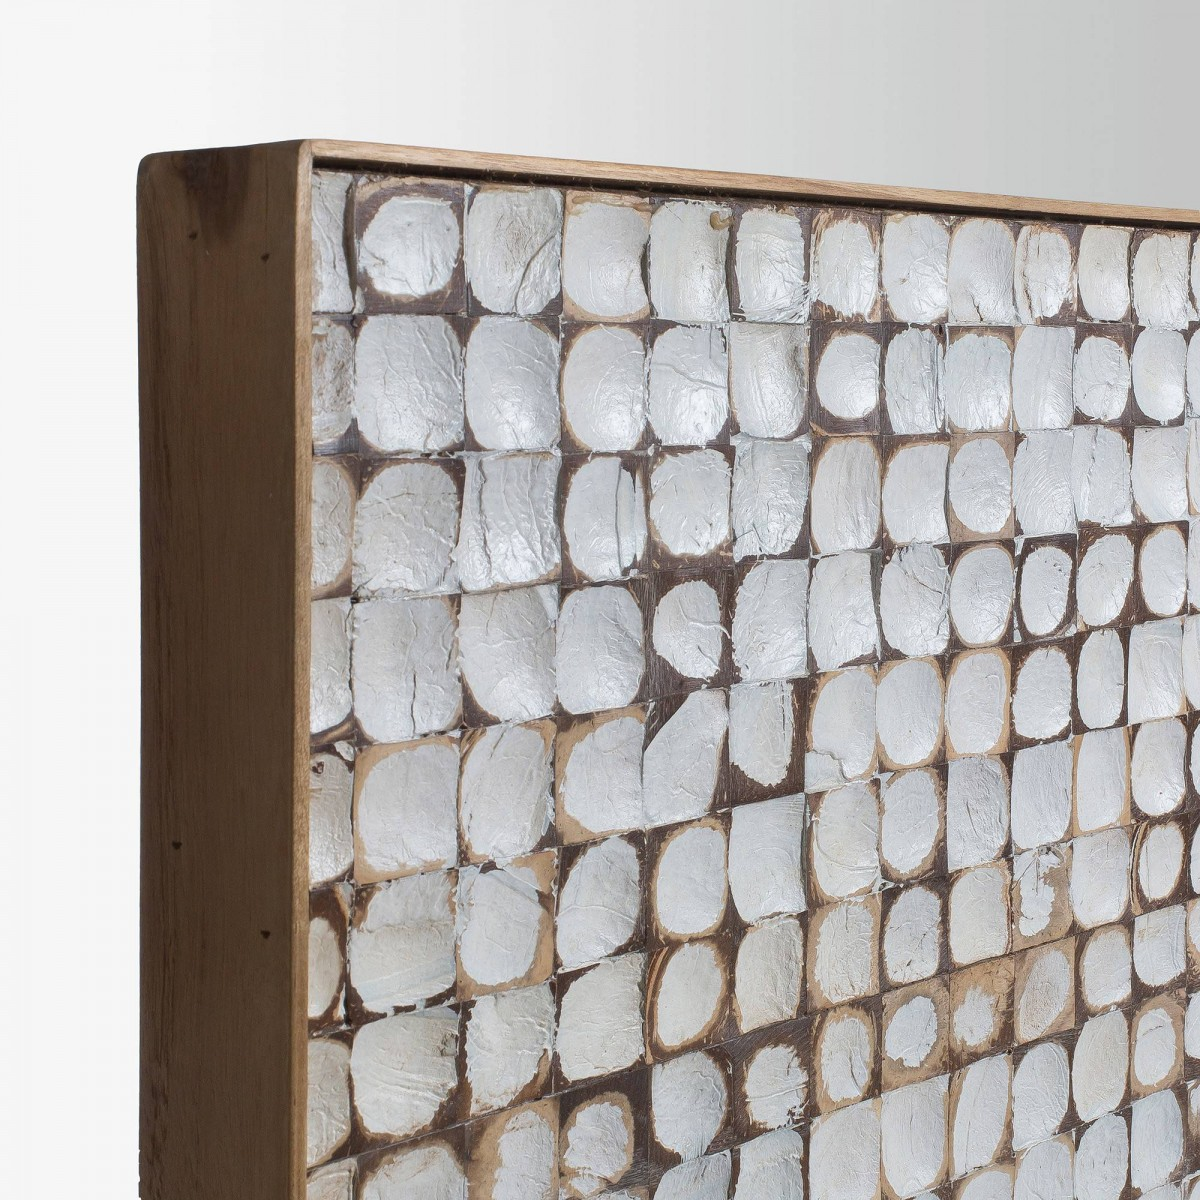 Cabecero 174cm madera revestido con mosaico de coco tropical - Mosaico de madera ...